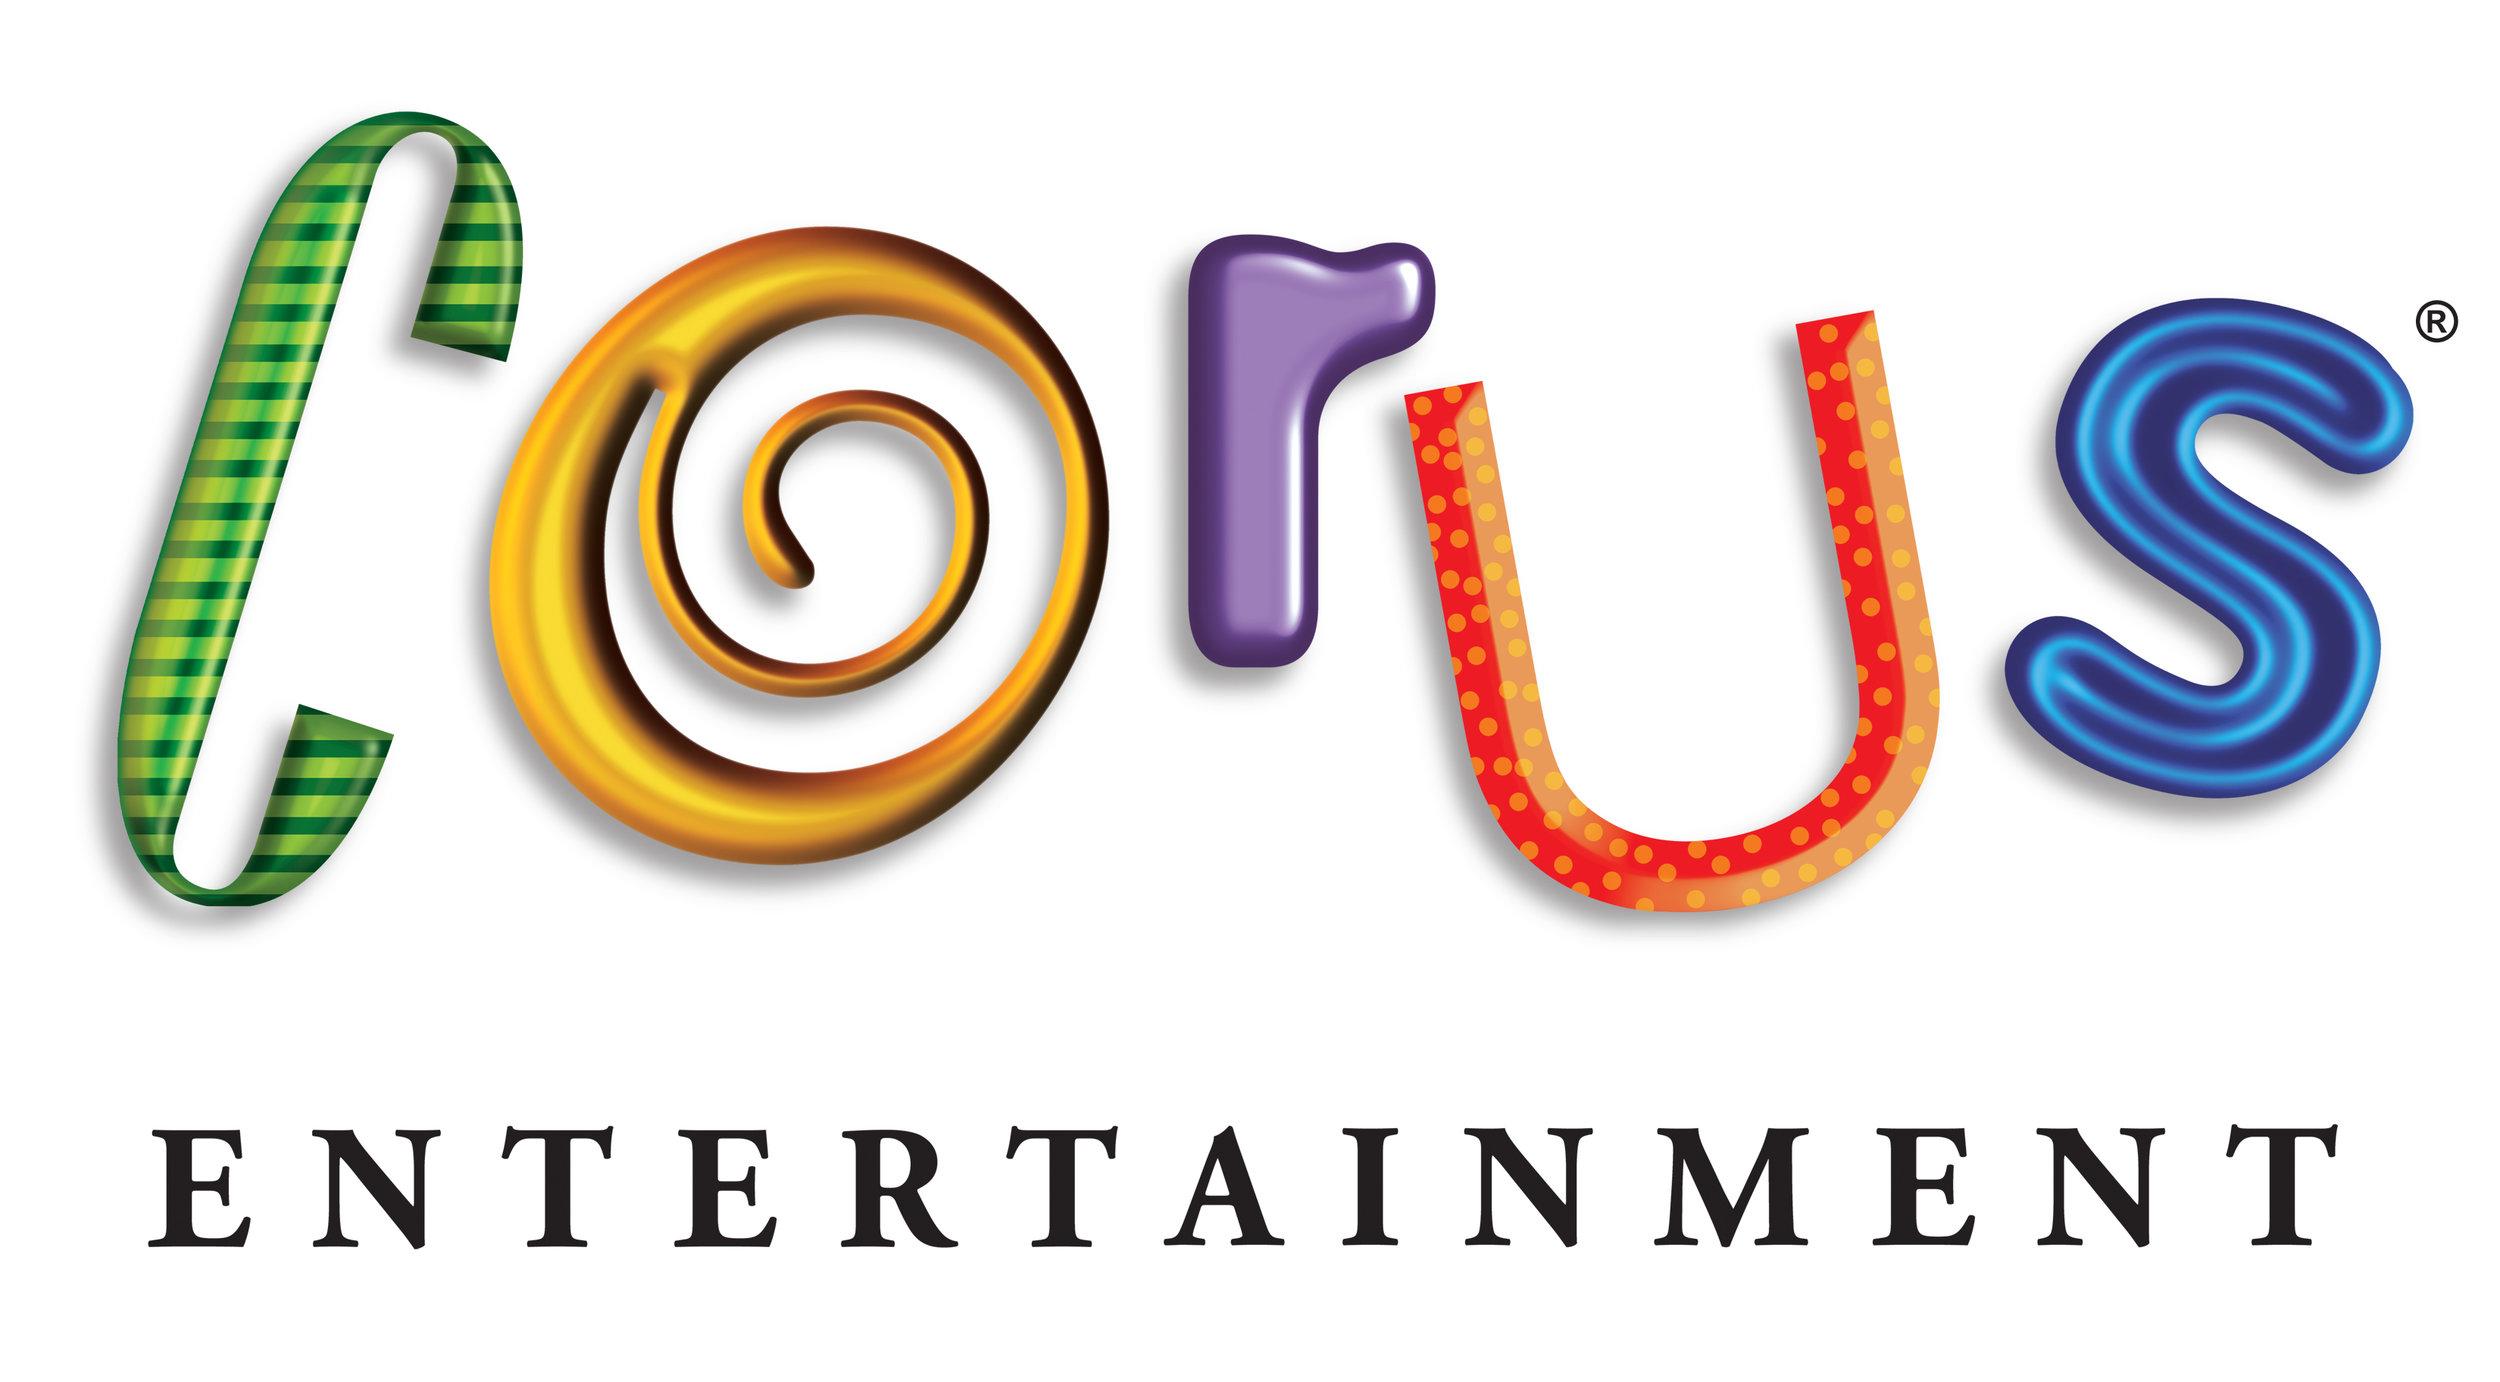 corusl_logo.jpg